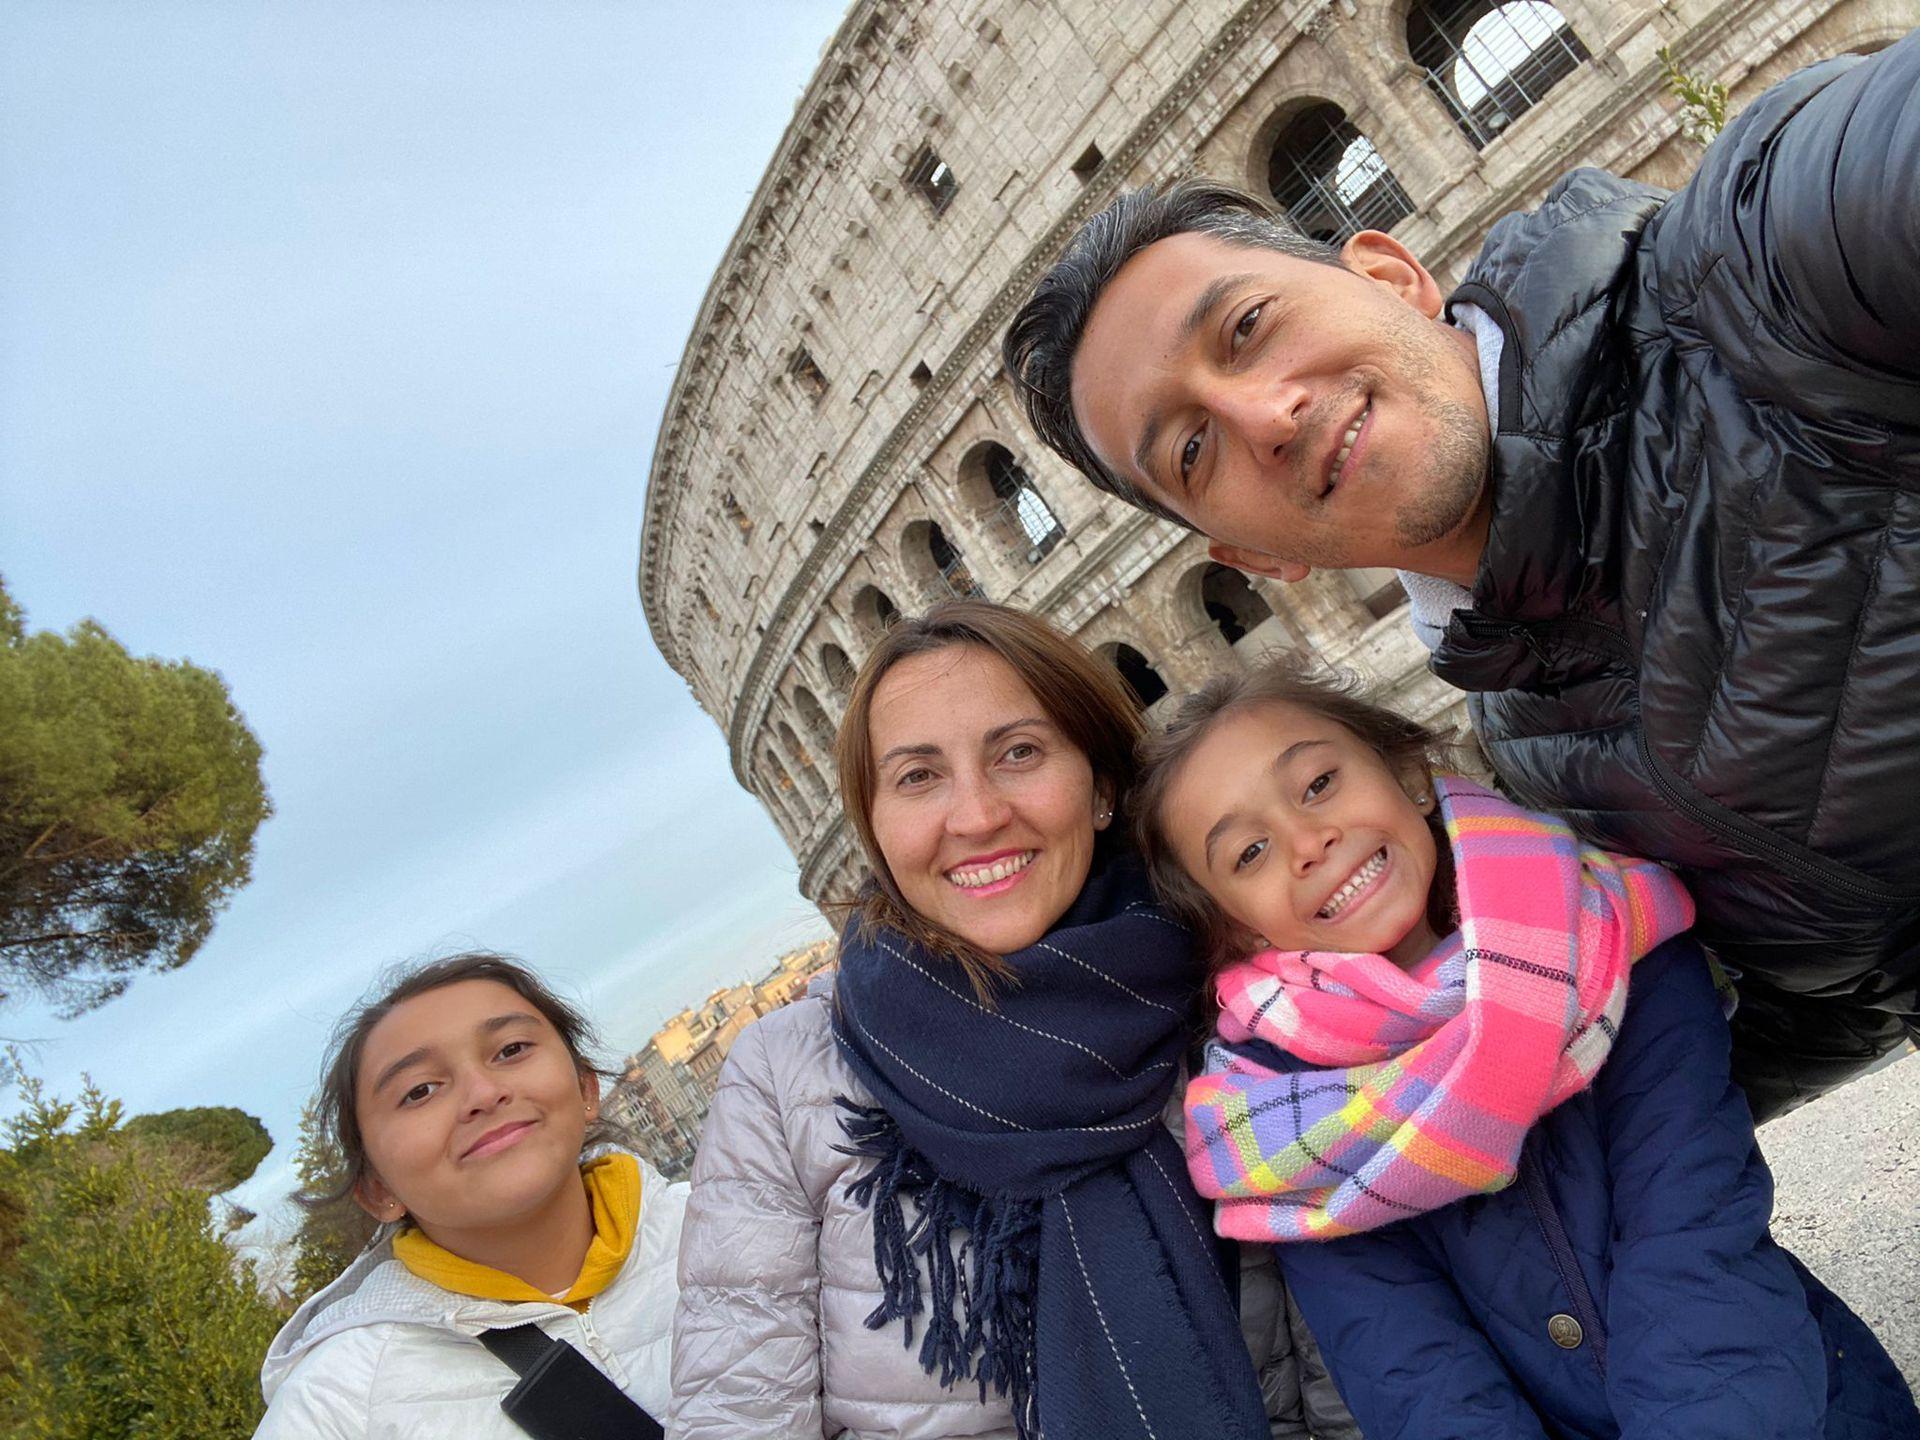 """Para una familia de 4, tenés un gasto mensual de 2000 a 3000 euros, dependiendo del nivel de vida"", indica Juan Pablo"